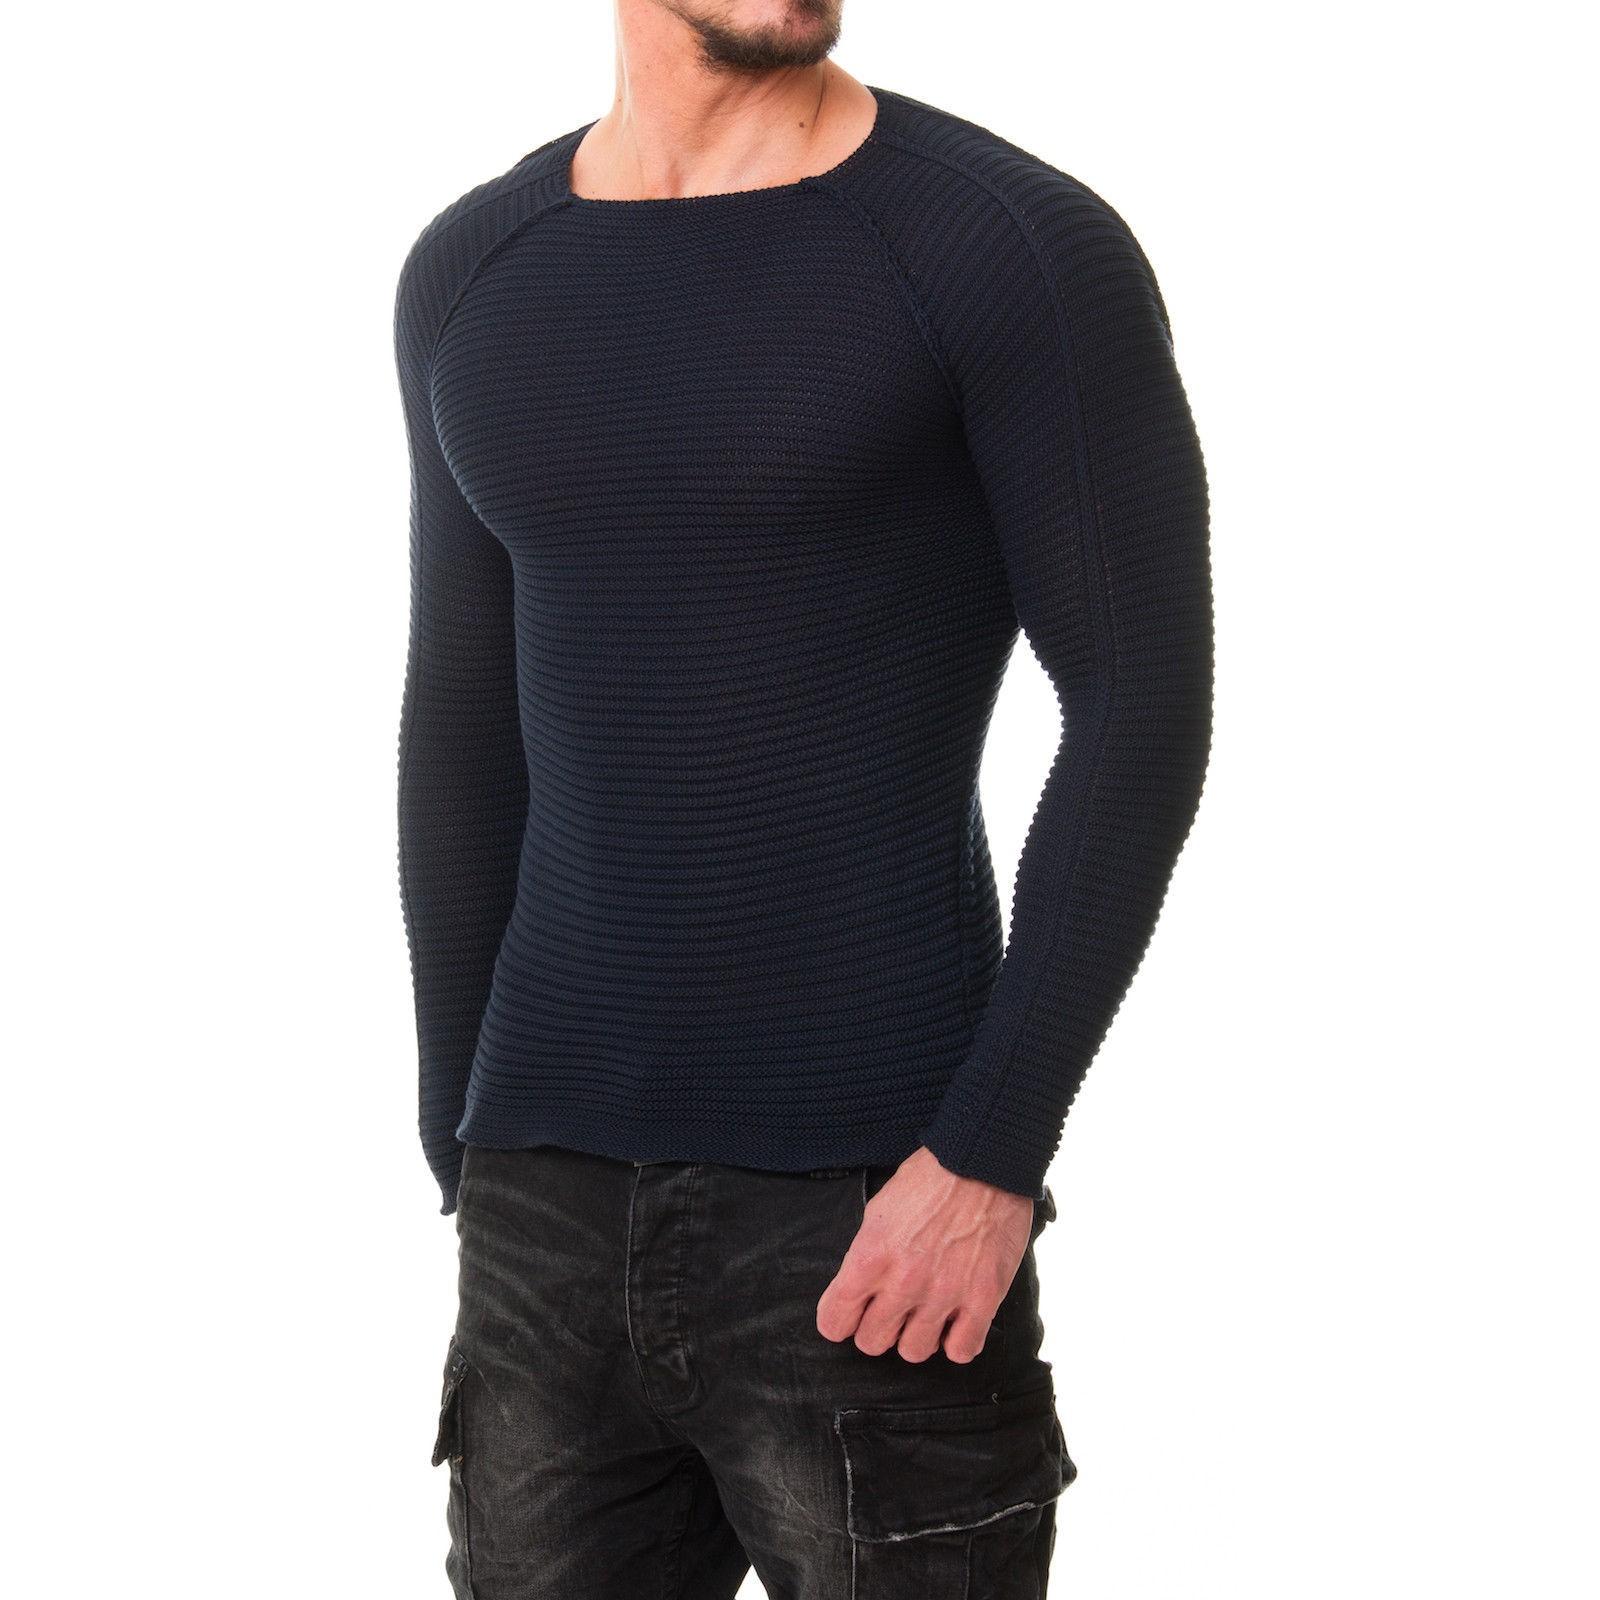 herren strick 1442 pullover sweat shirt fitness netz body slim fit. Black Bedroom Furniture Sets. Home Design Ideas